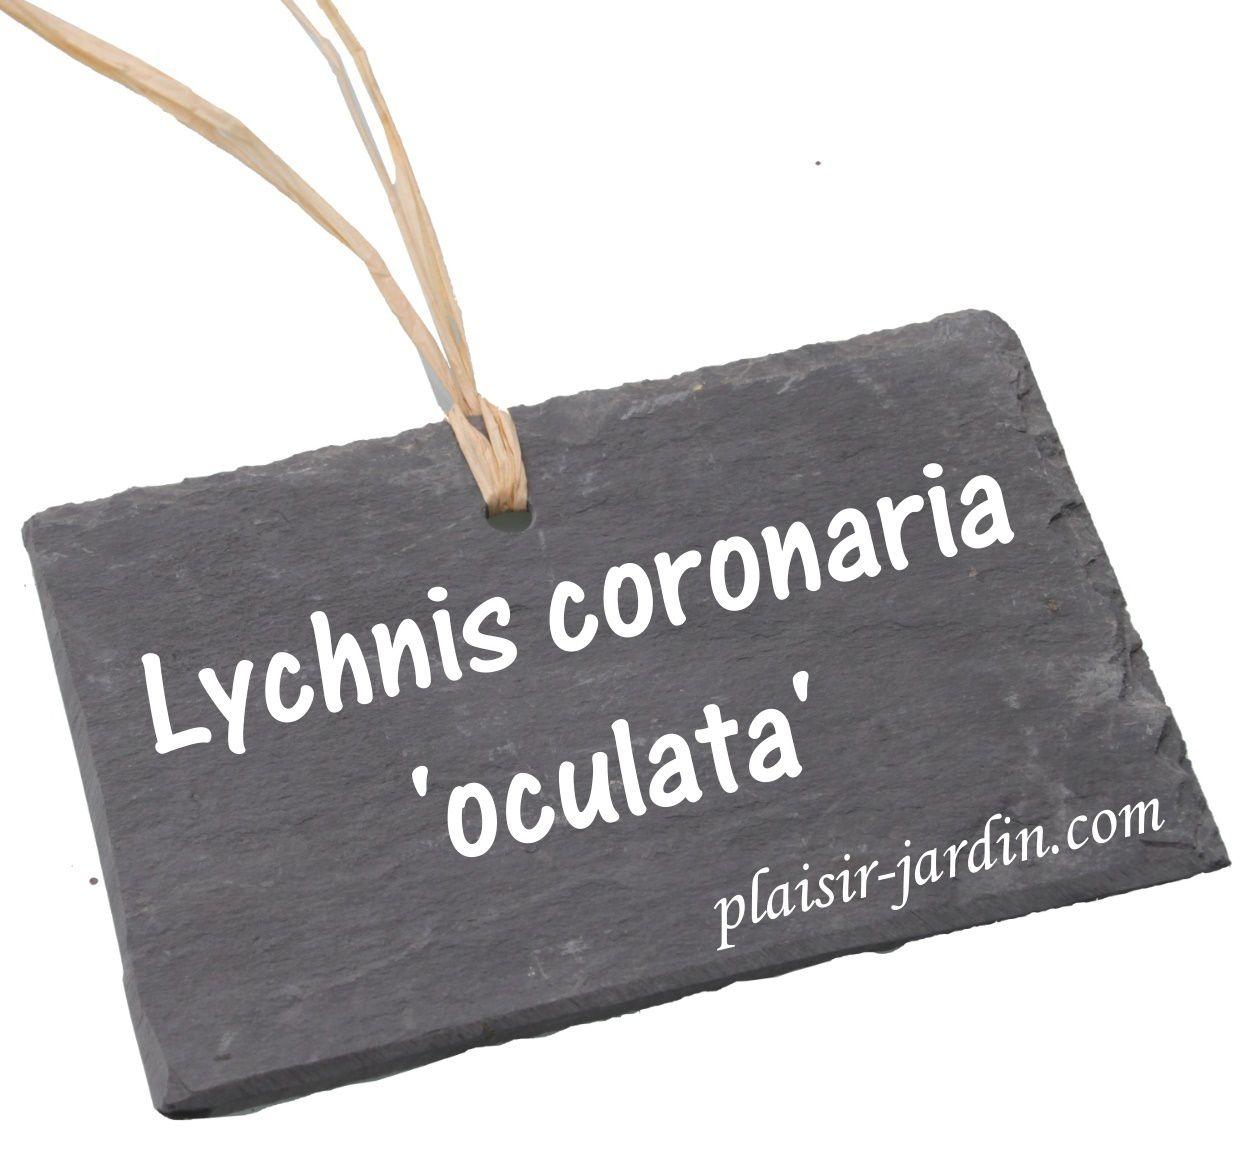 Le Lychnis coronaria oculata